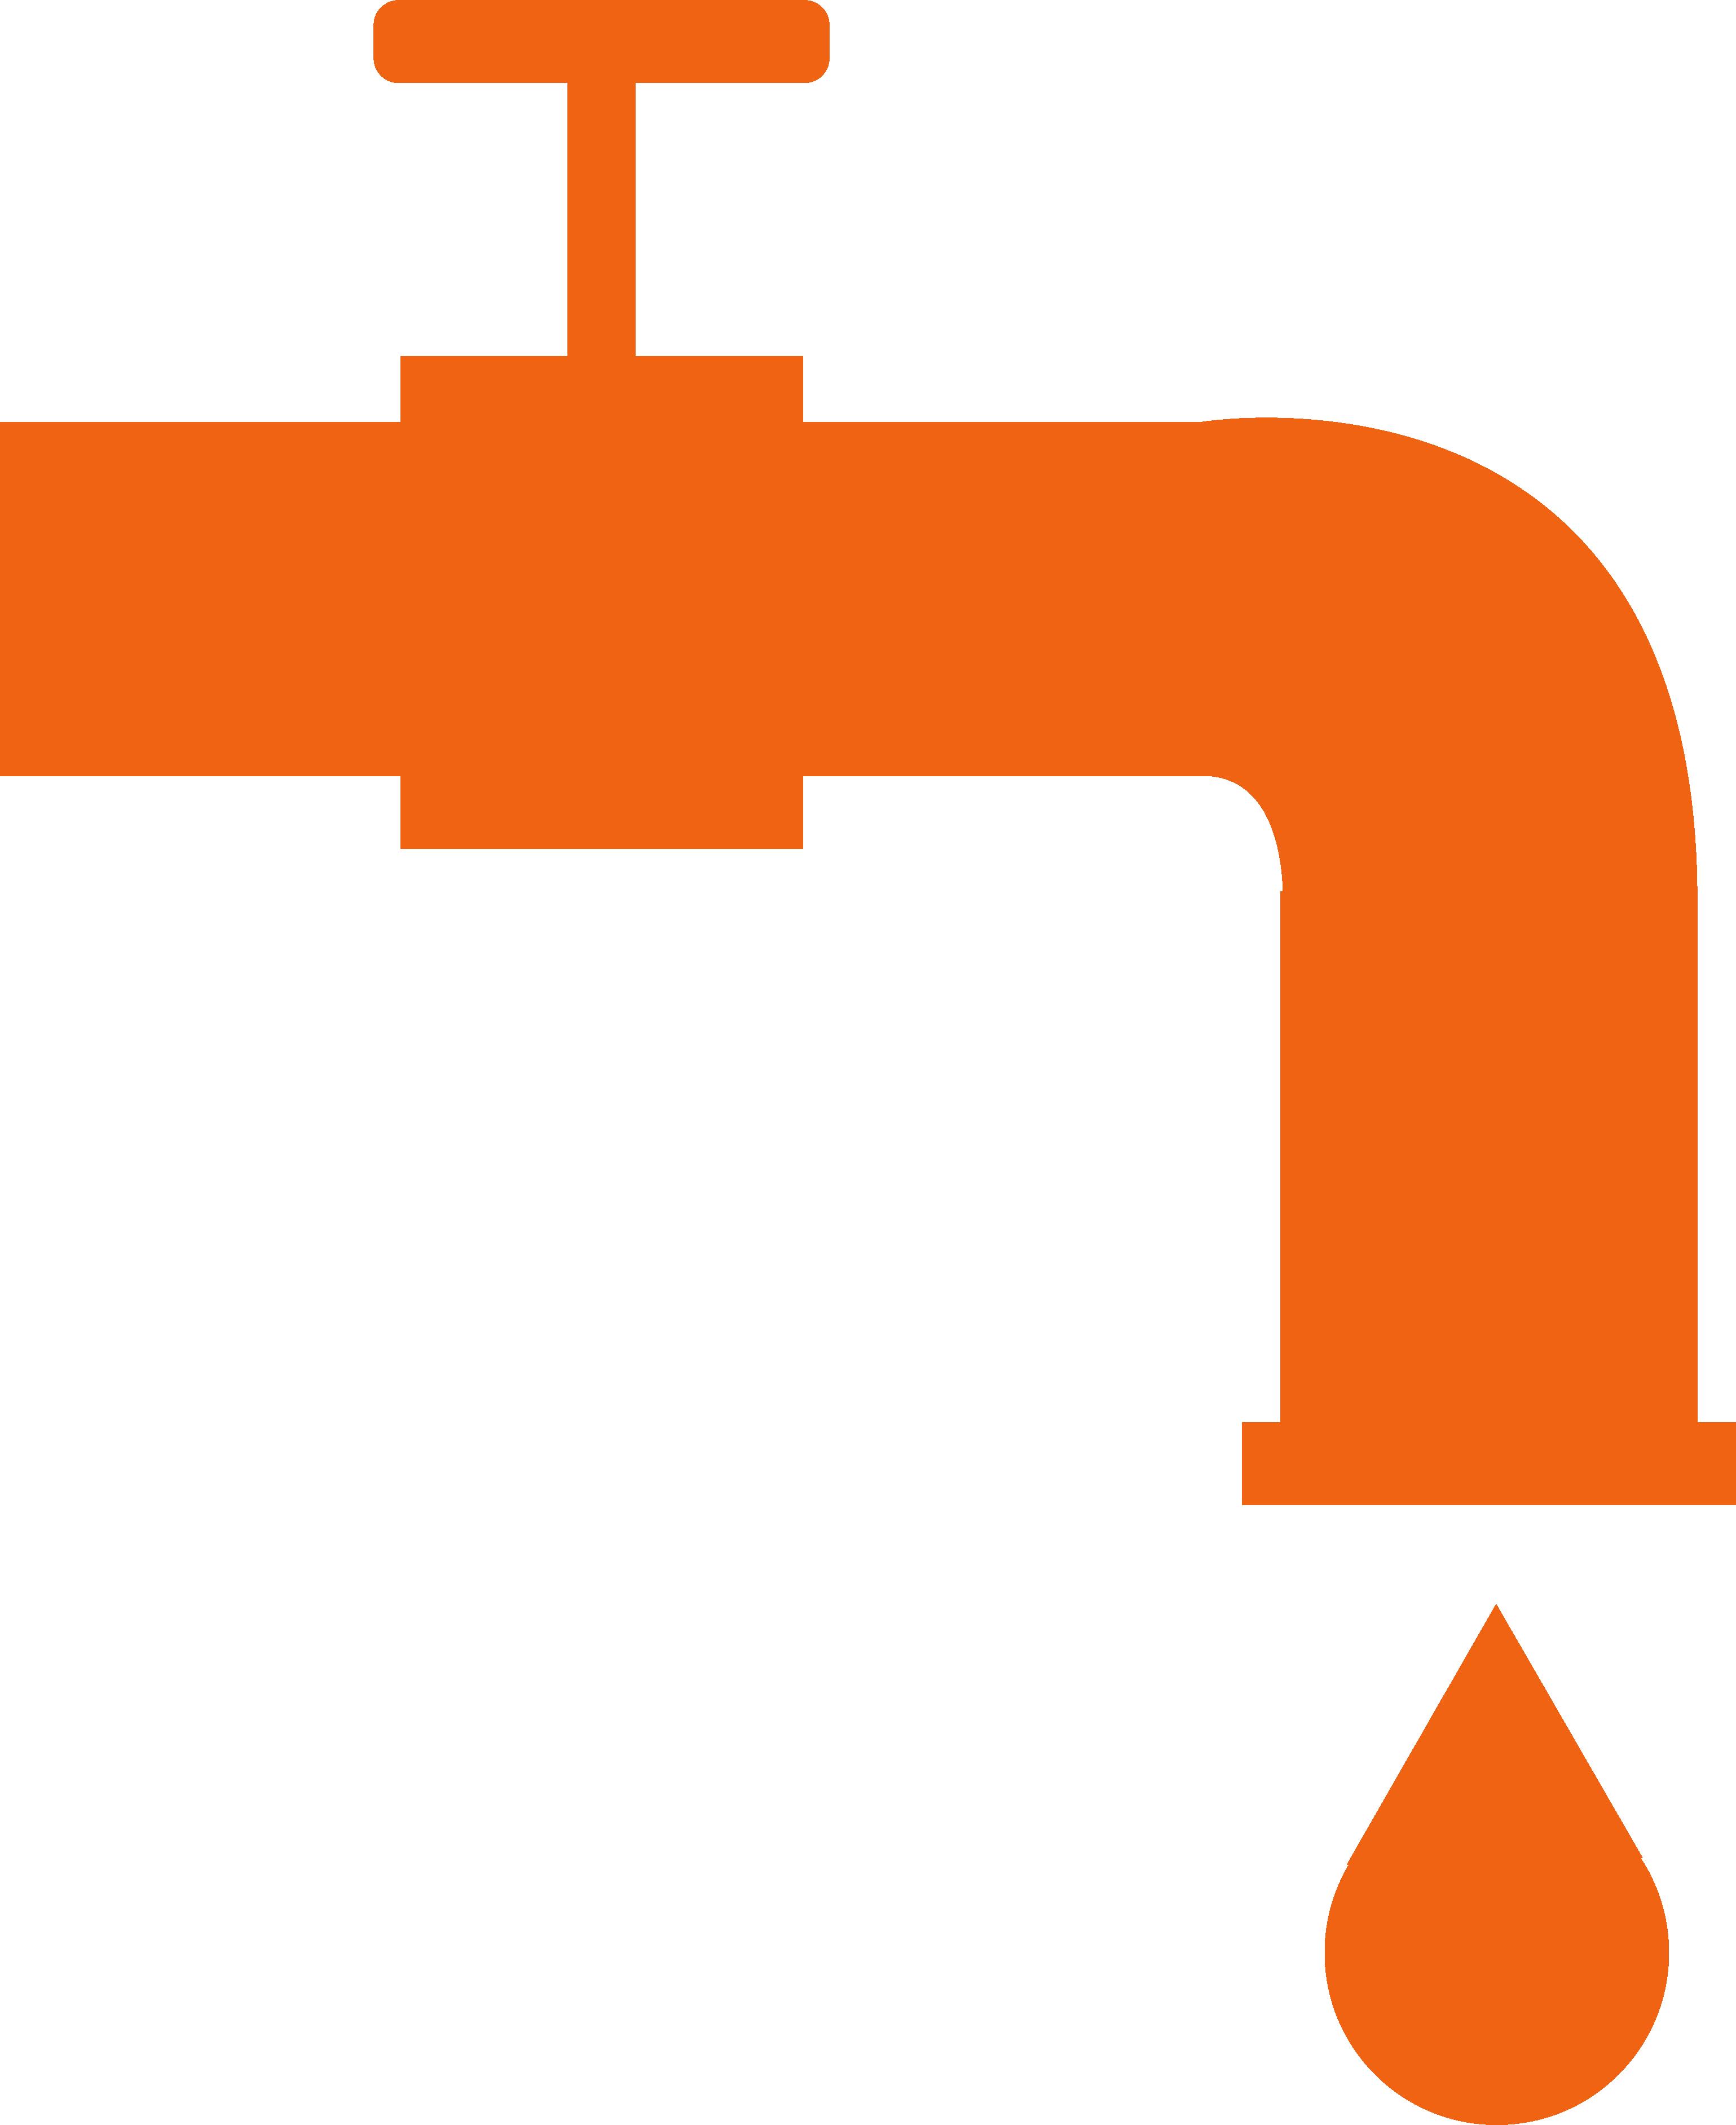 Plomberie picto - Activités